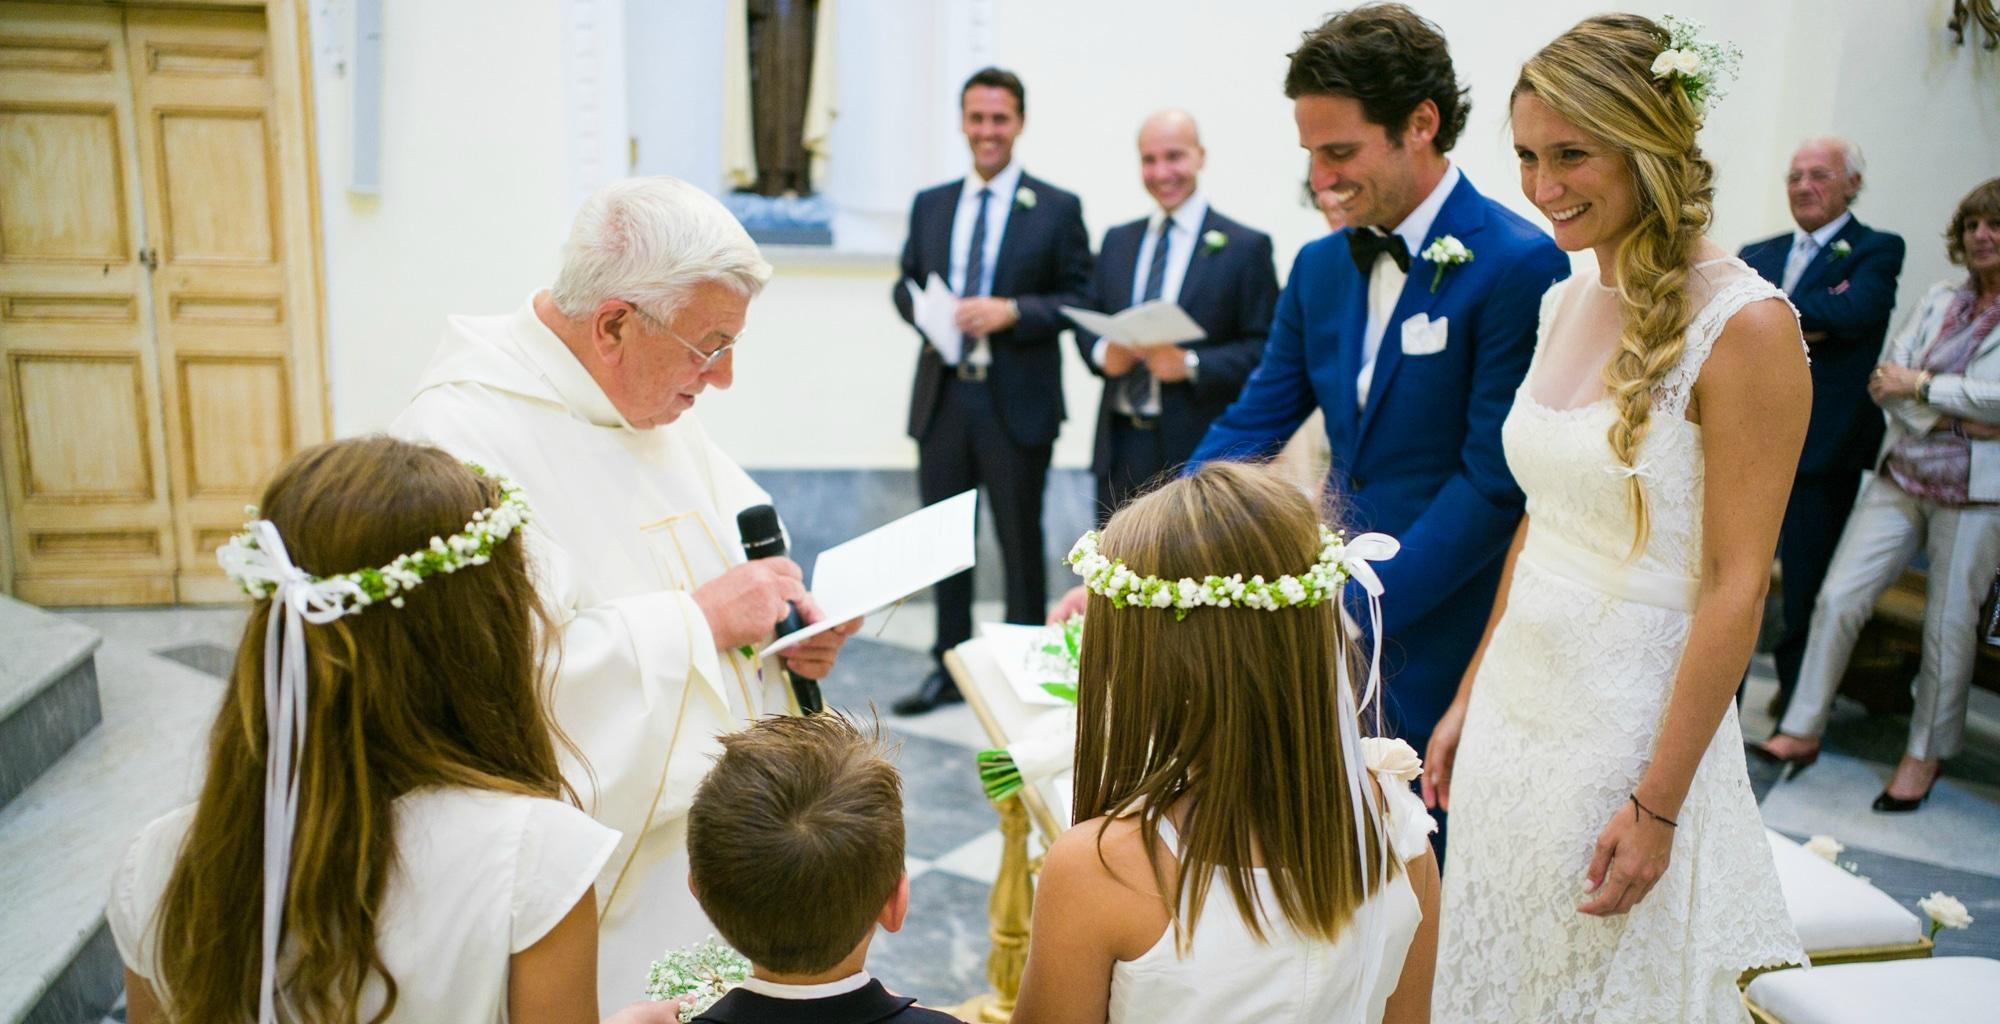 CATHOLIC WEDDING IN CAPRI